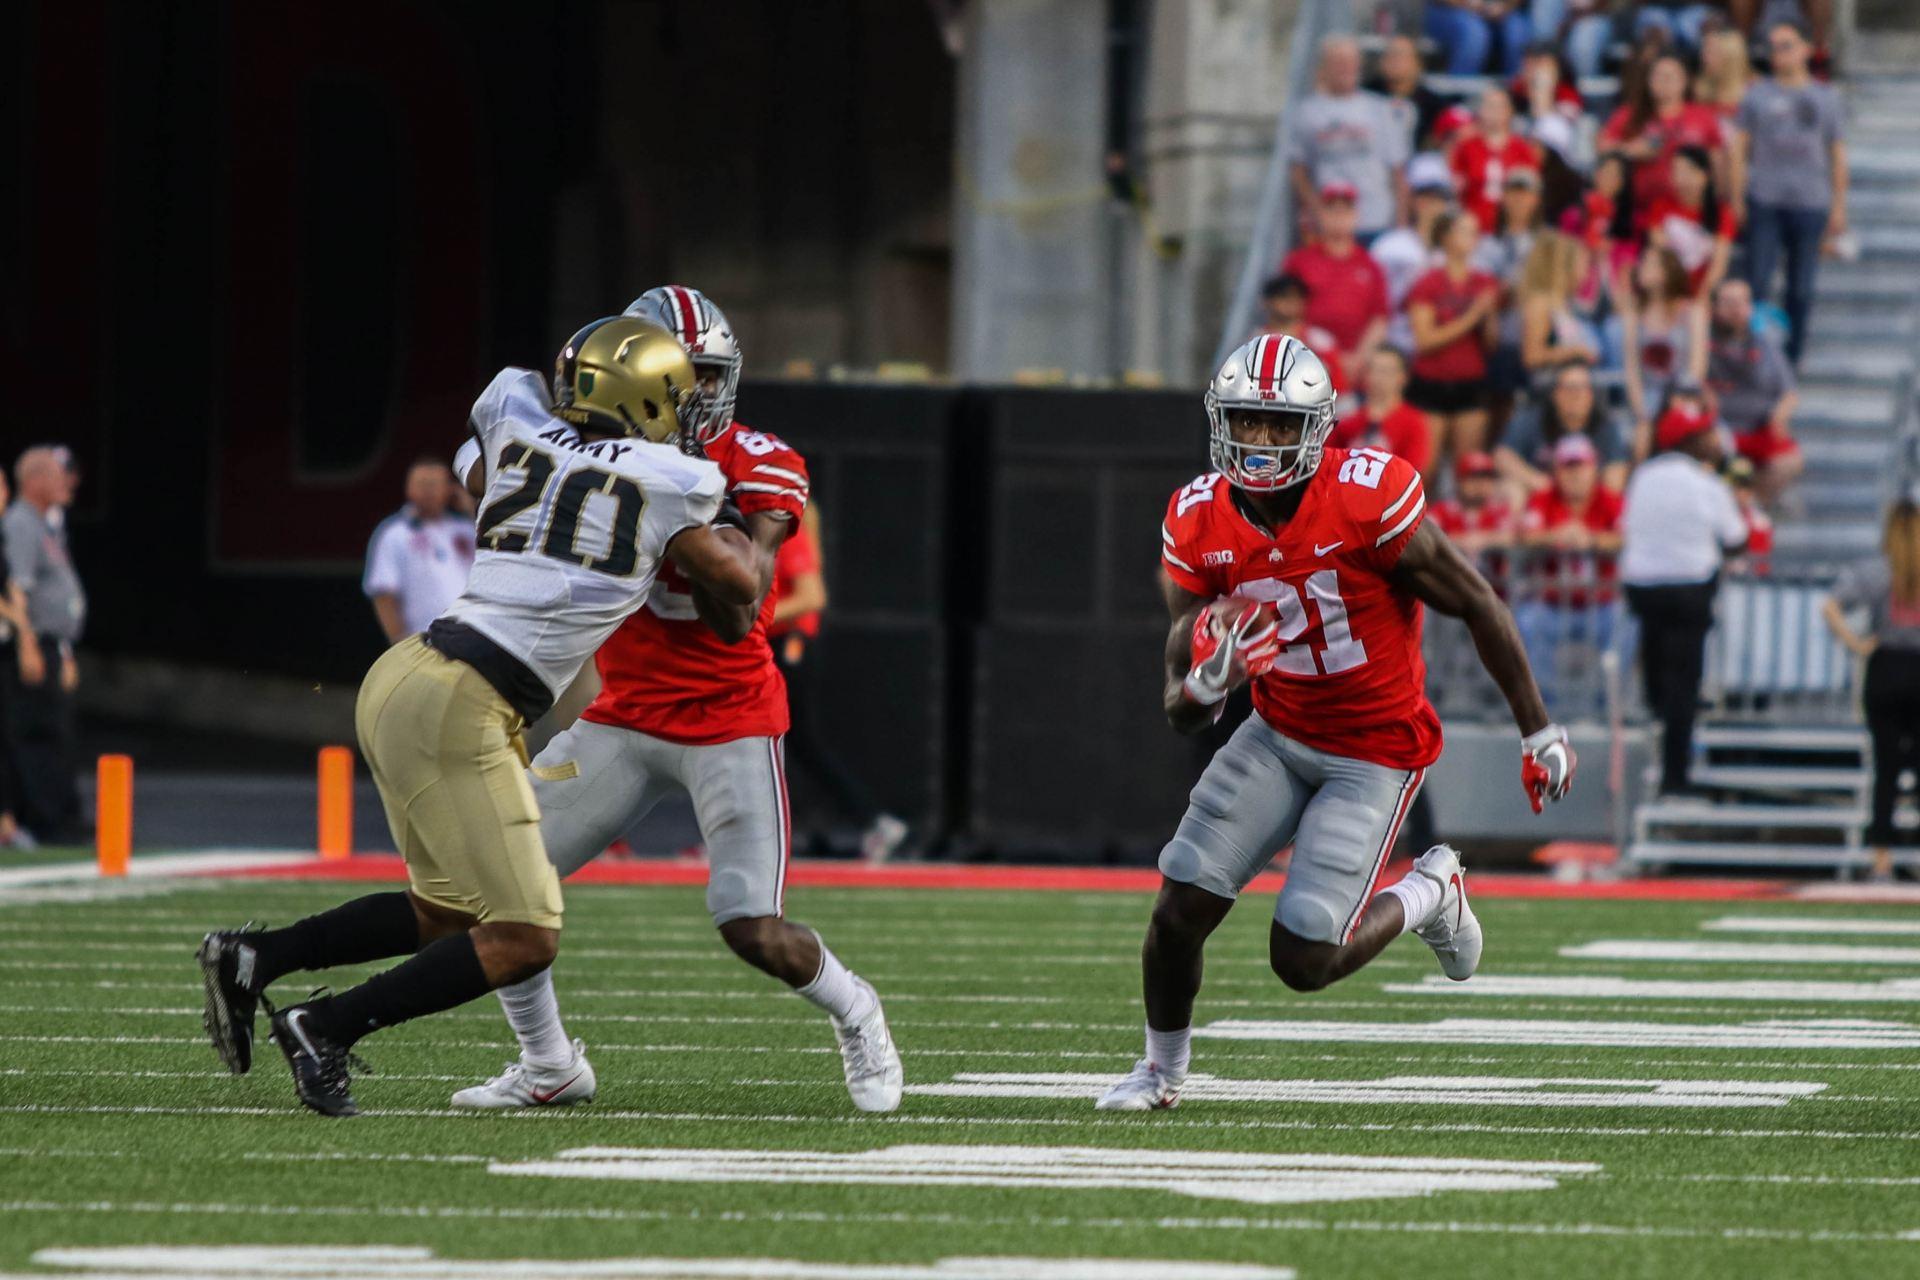 Ohio State S Big Plays This Season Stem From Perimeter Blocking